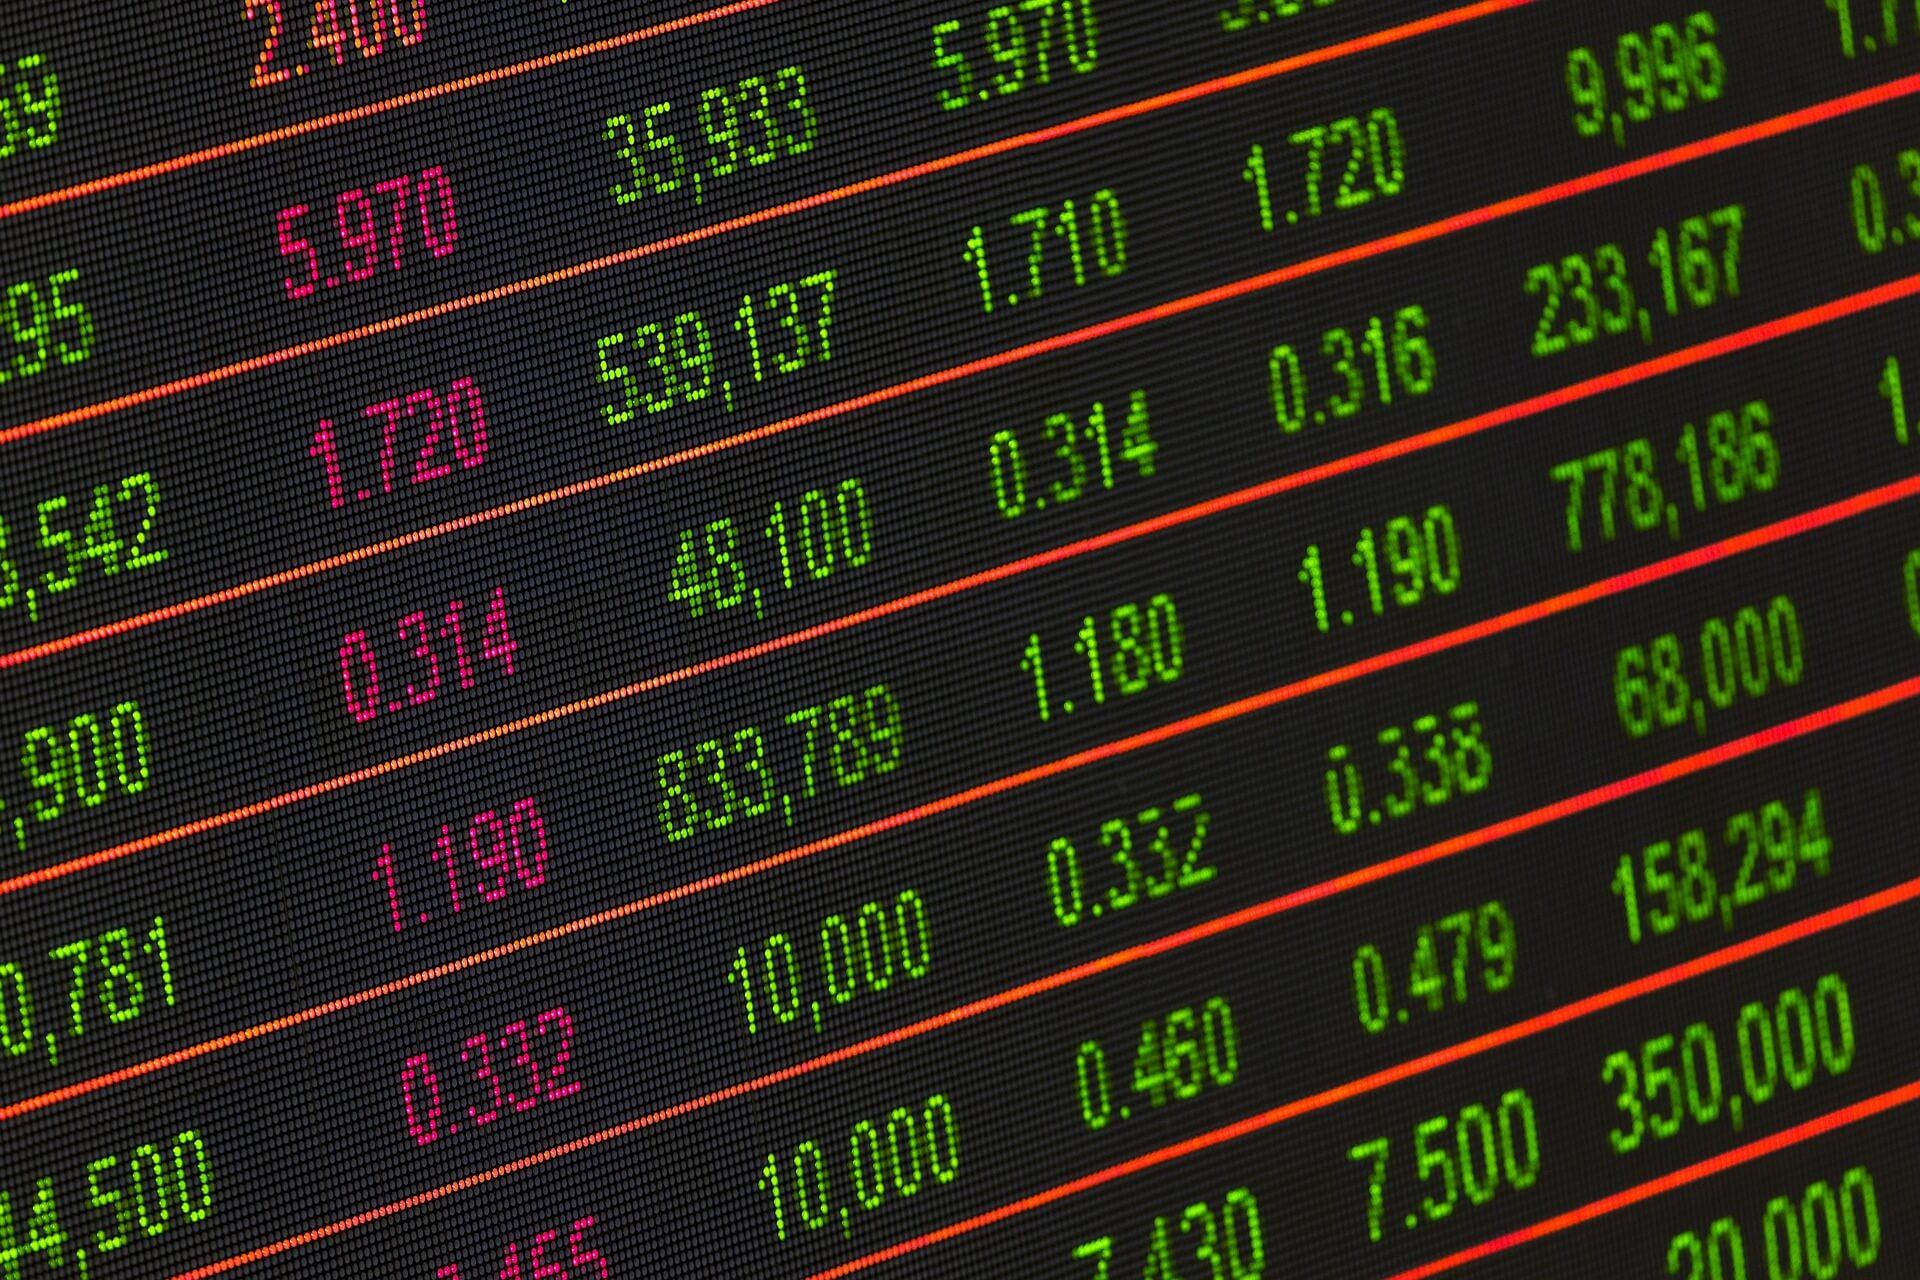 Health insurer Aetna smashes profit estimates, raises forecast